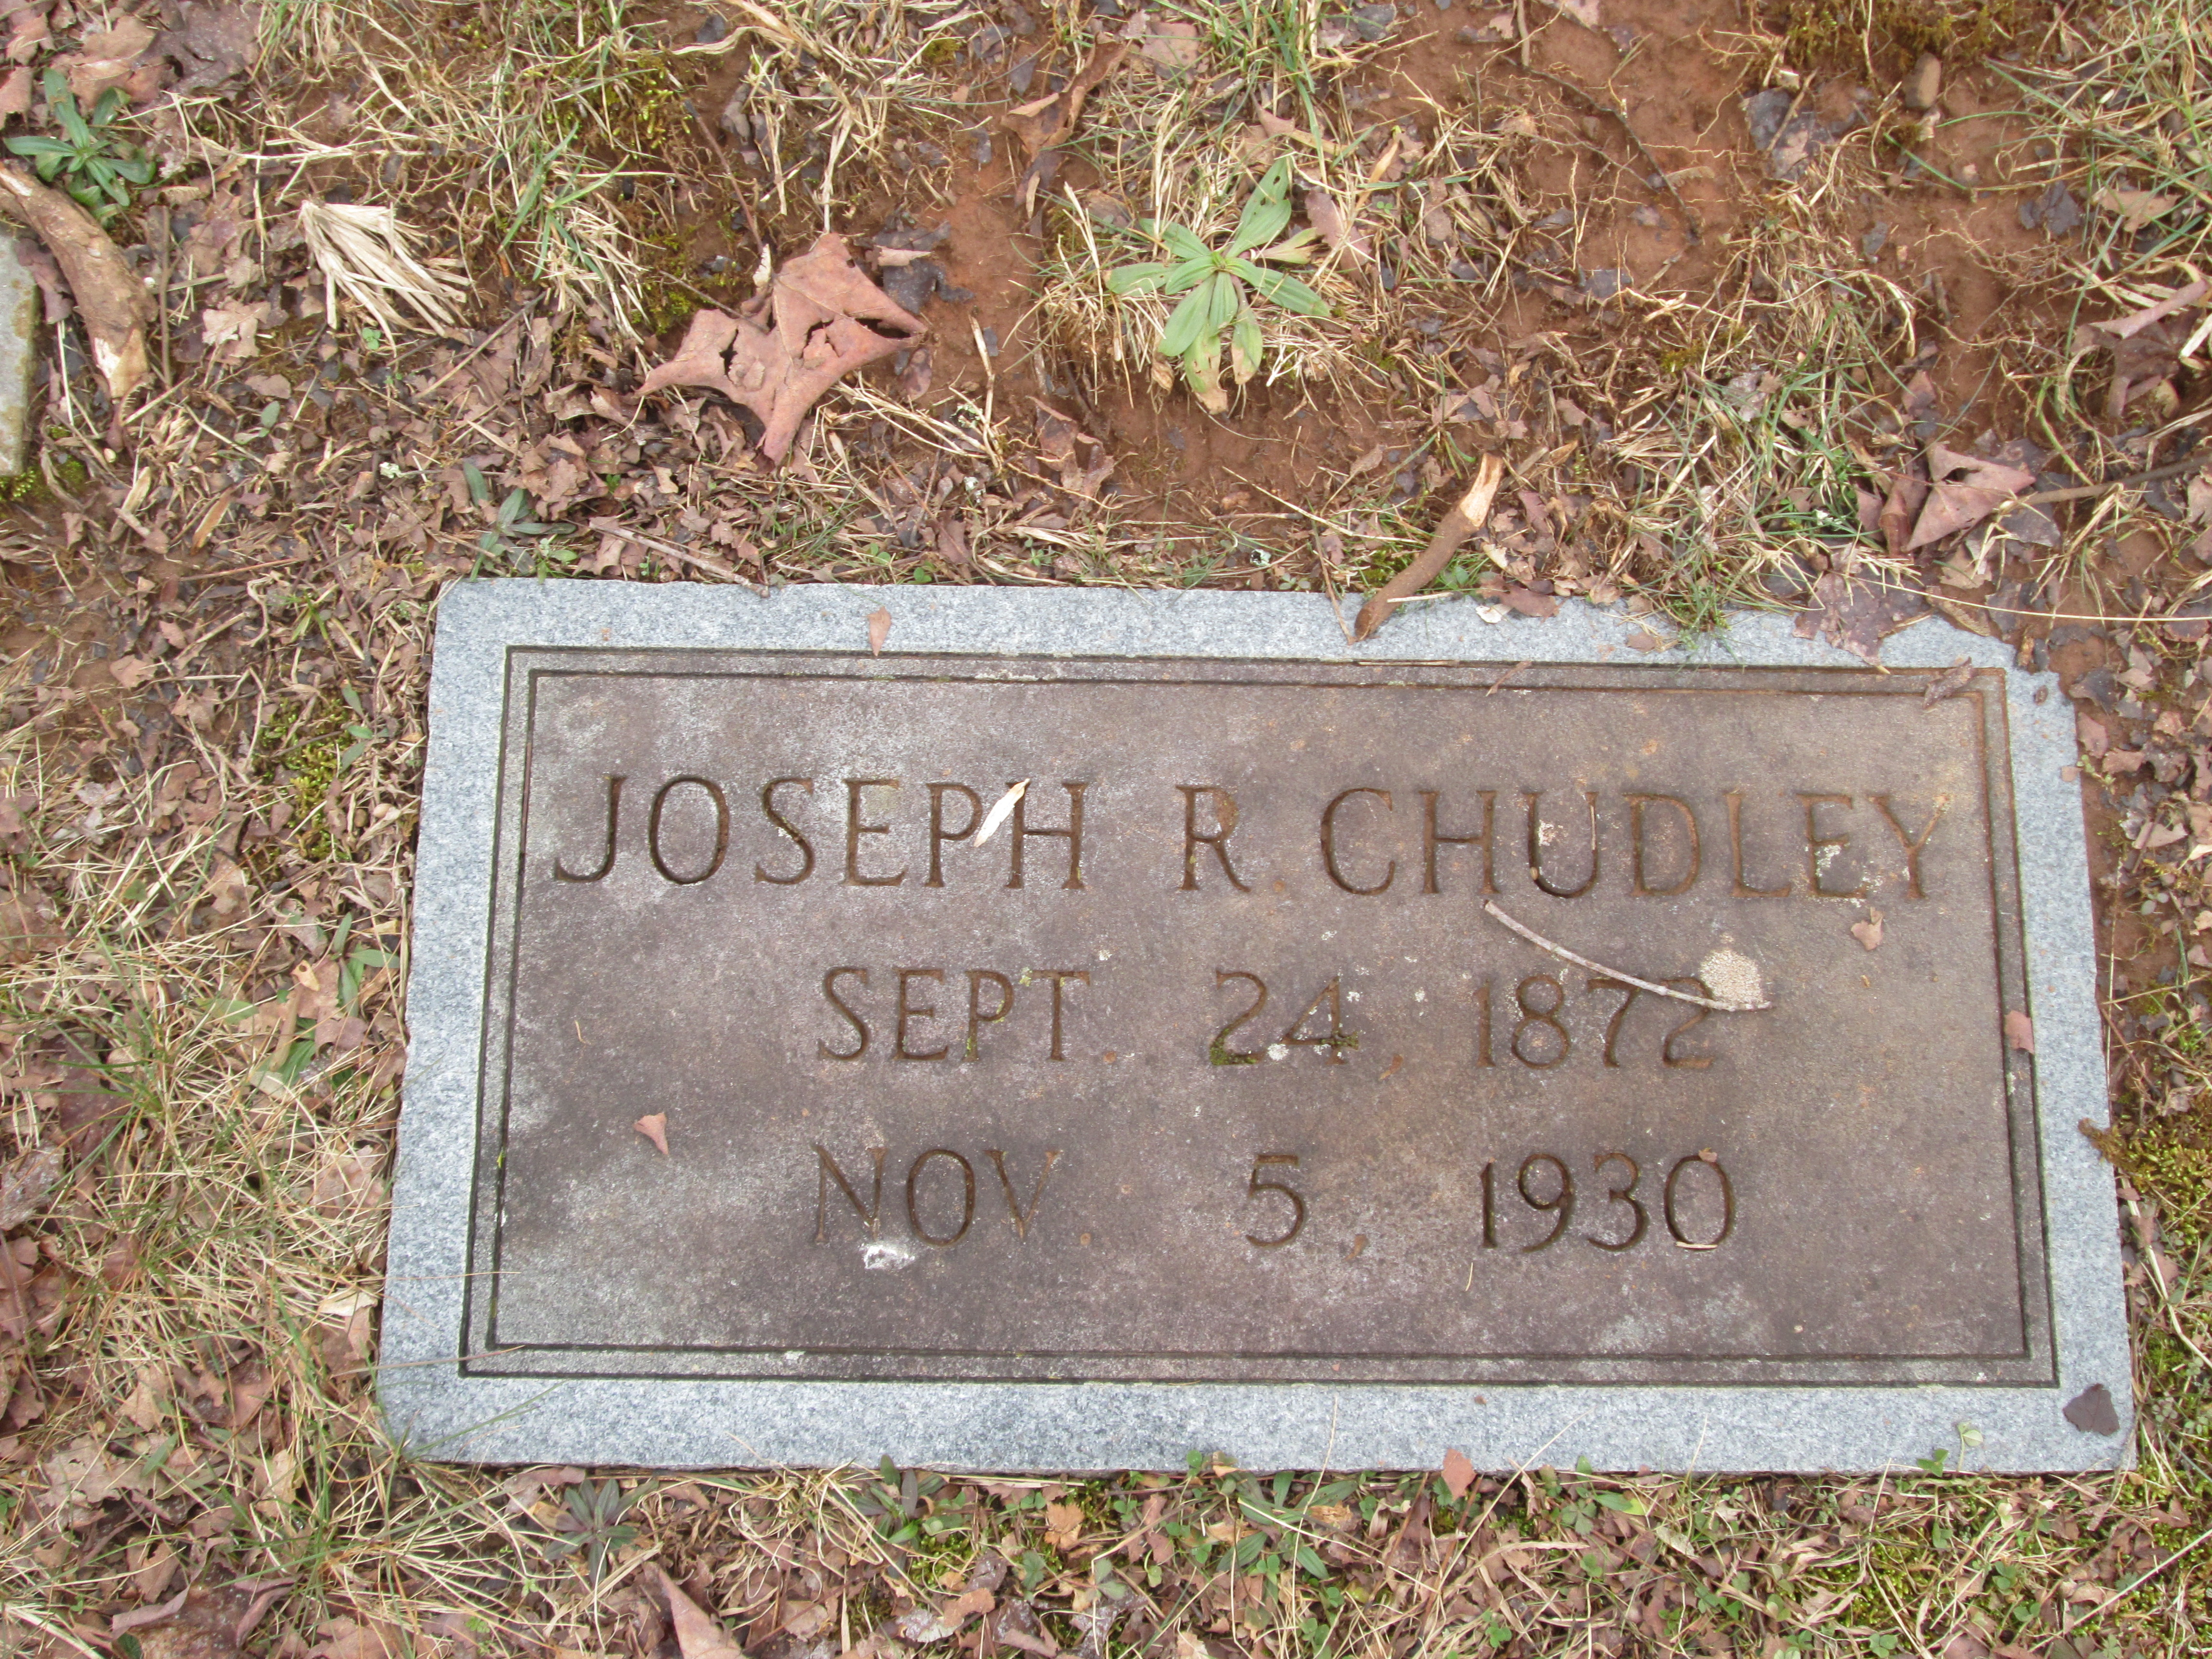 Joseph Rule Chudley